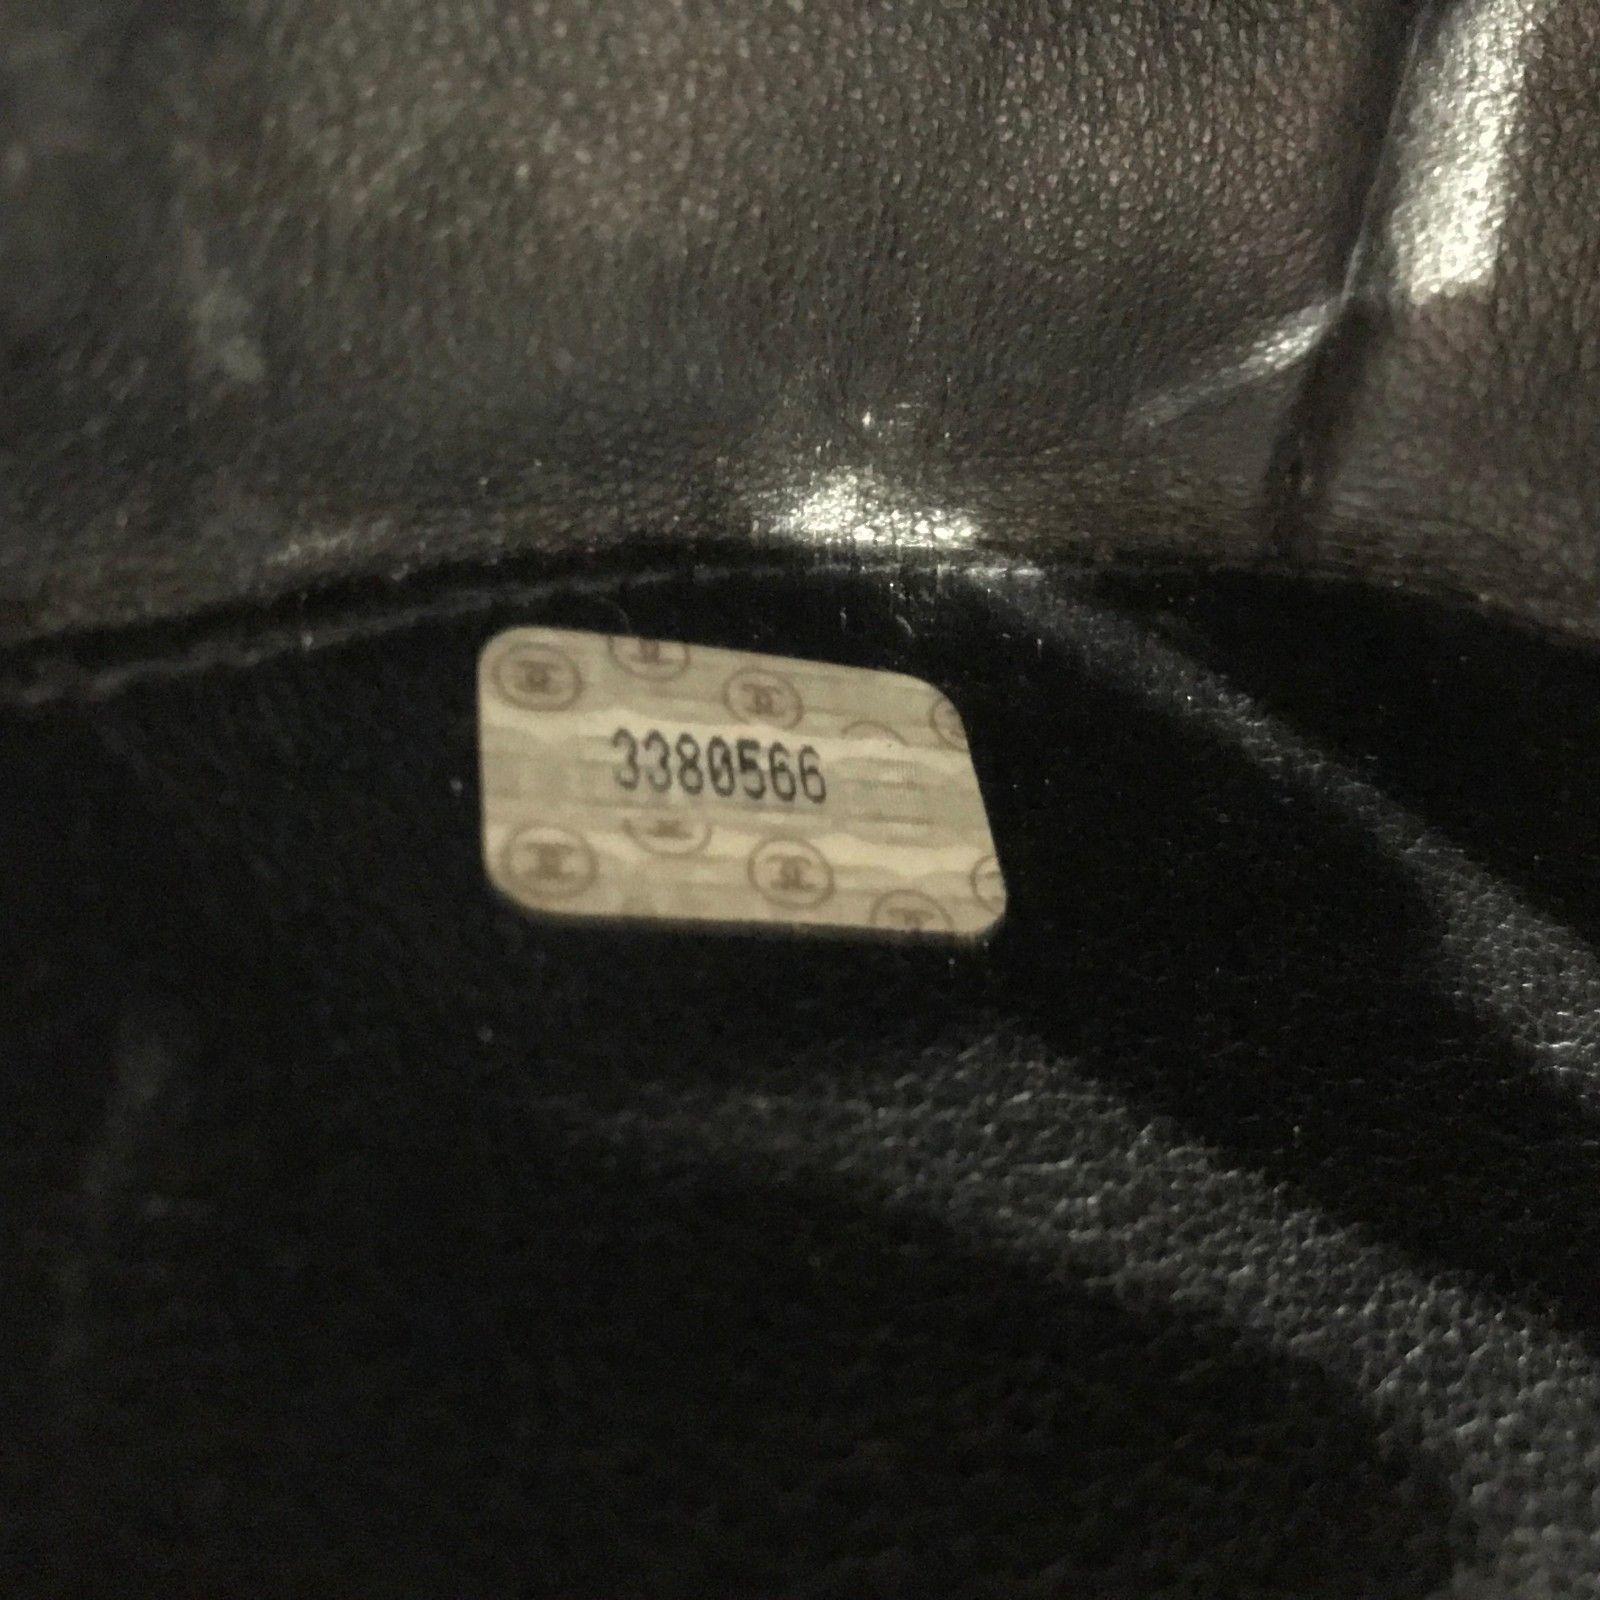 09613d7d8c1f CHANEL VINTAGE Round Vanity Case Black Quilted Patent Leather Purse Bag  Handbag